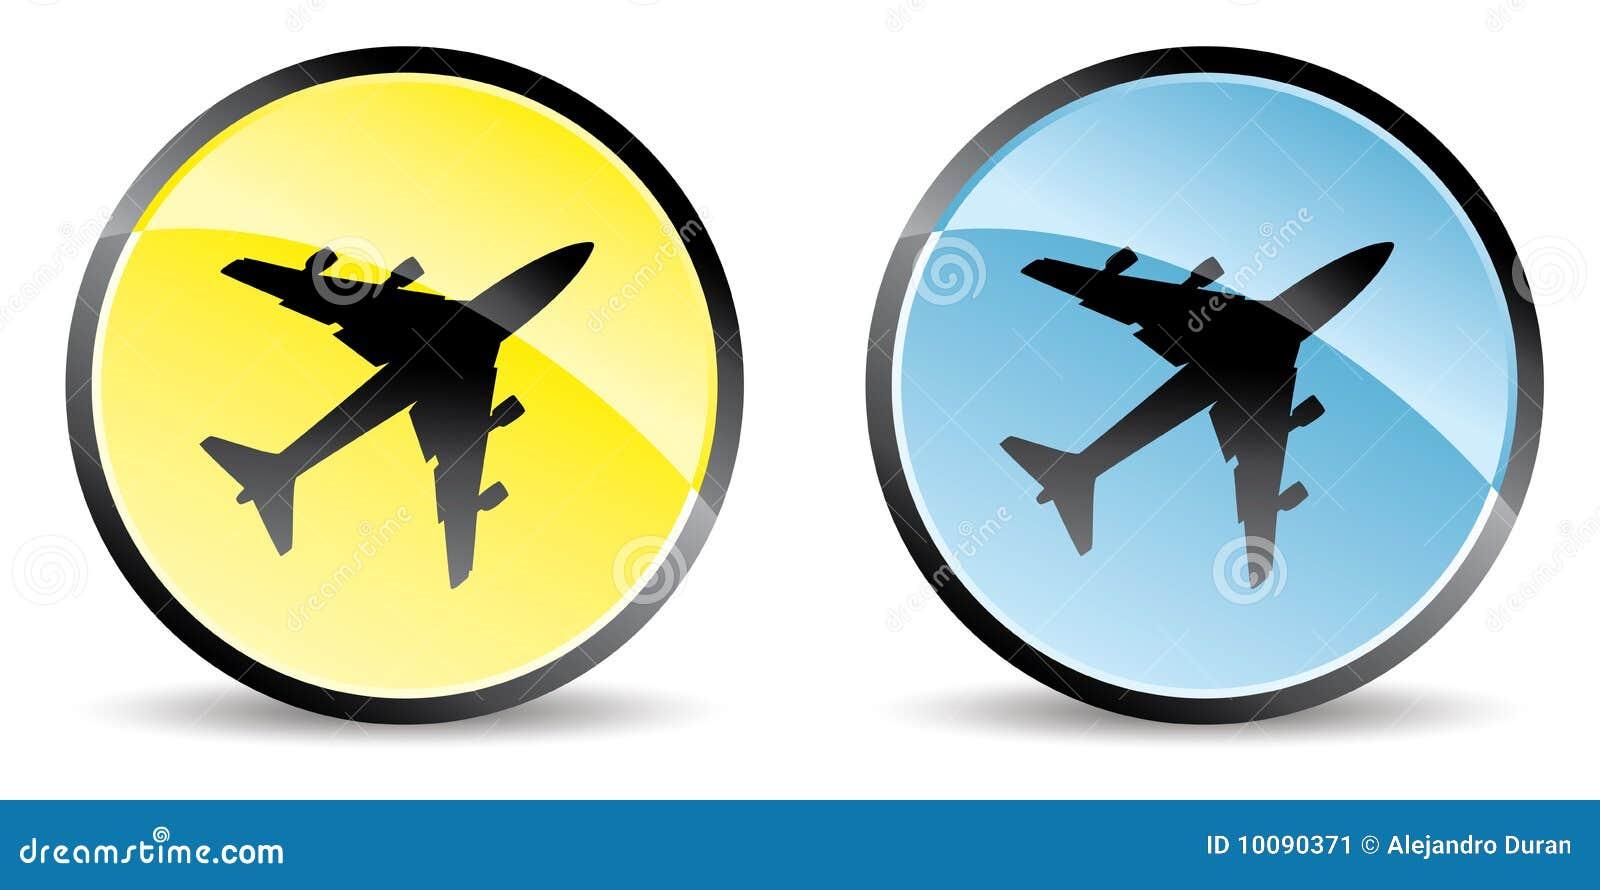 Airplane Icon Stock Image - Image: 10090371